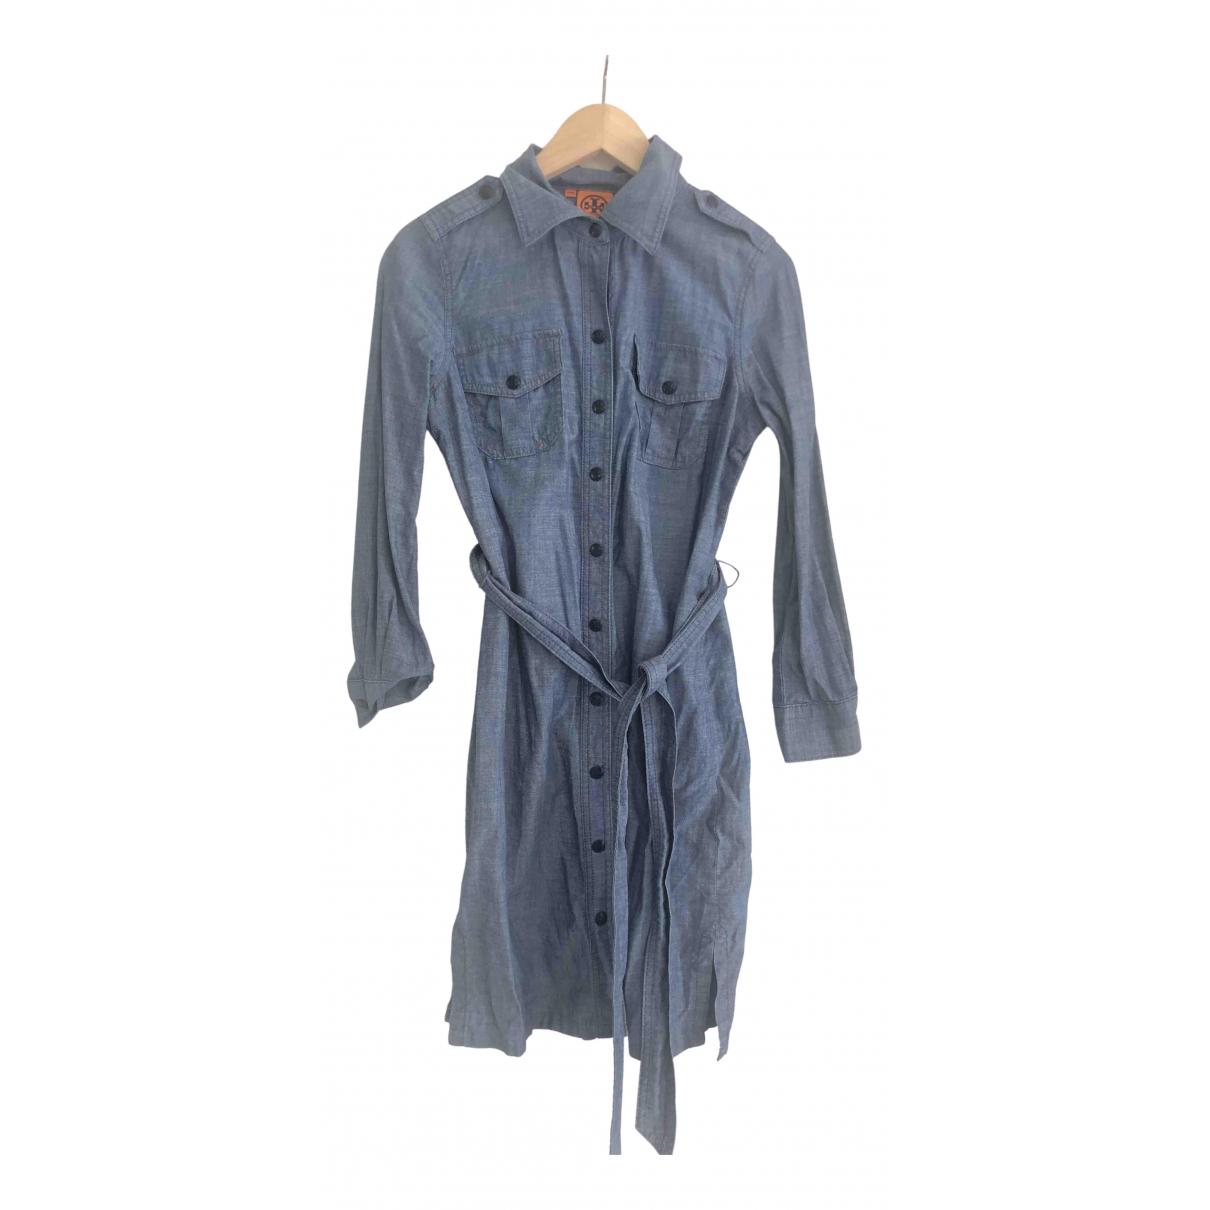 Tory Burch \N Blue Denim - Jeans dress for Women 4 US